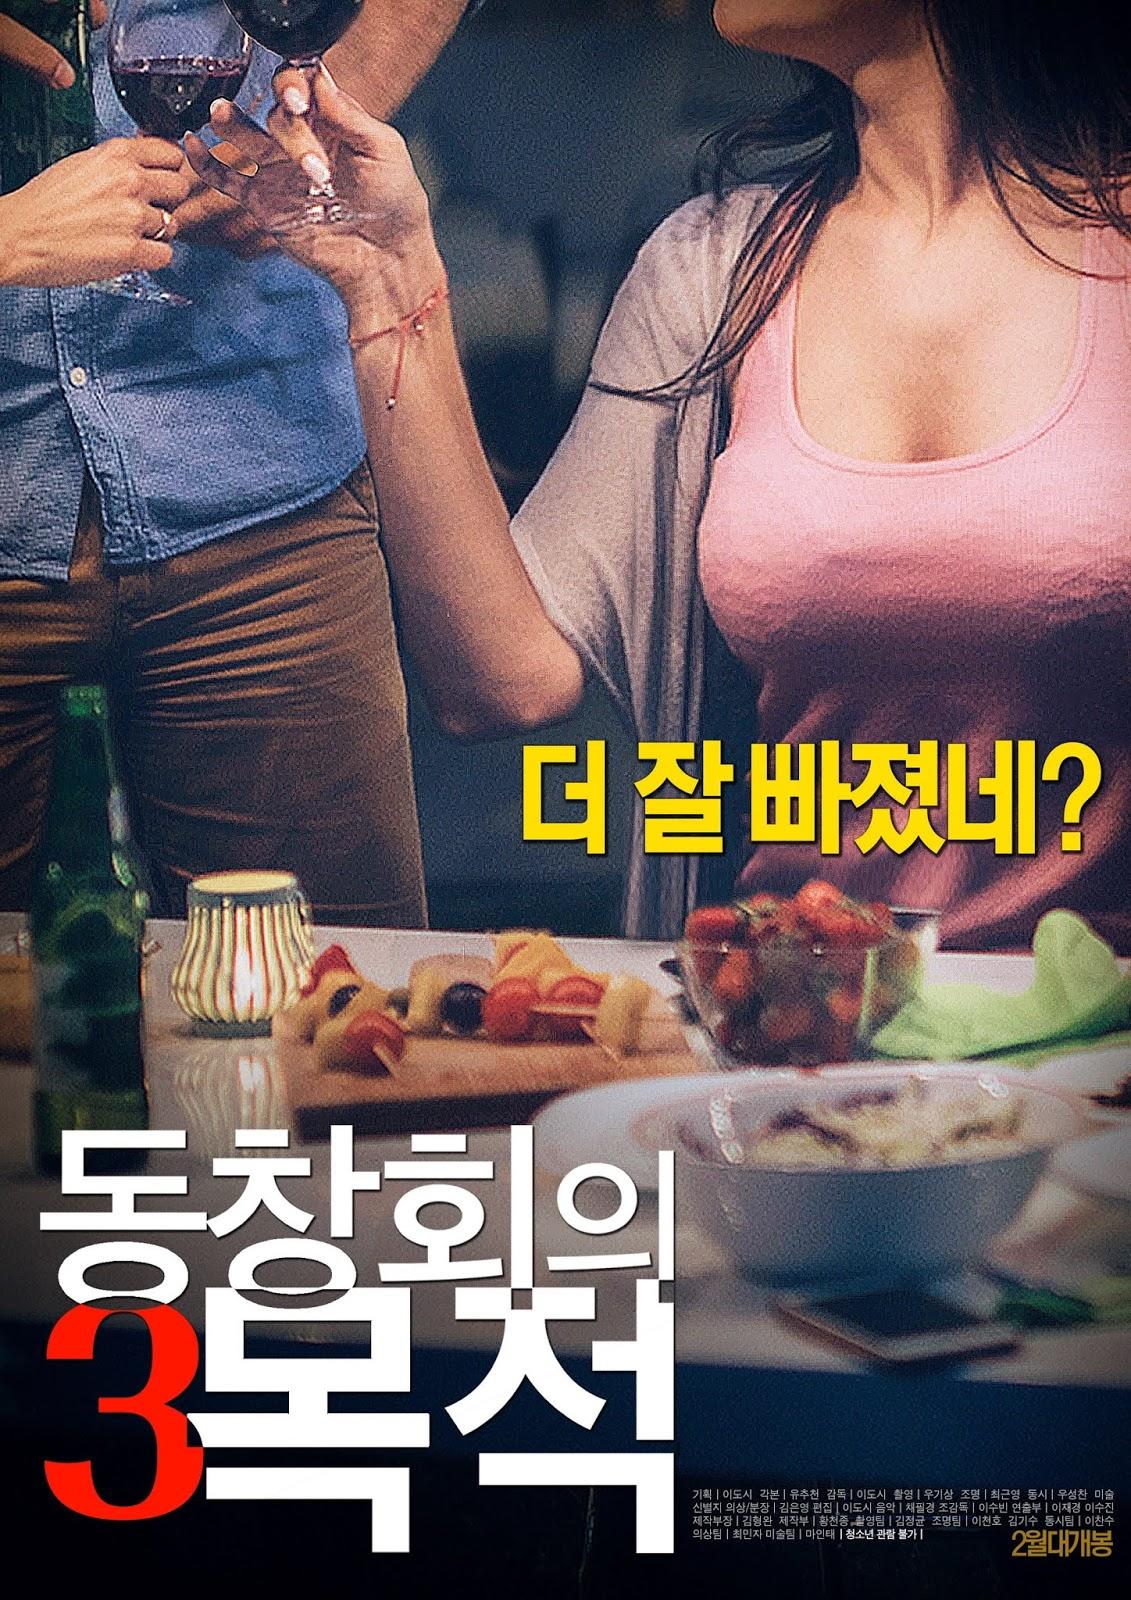 Purpose Of Reunion 3 Full Korea 18+ Adult Movie Online Free